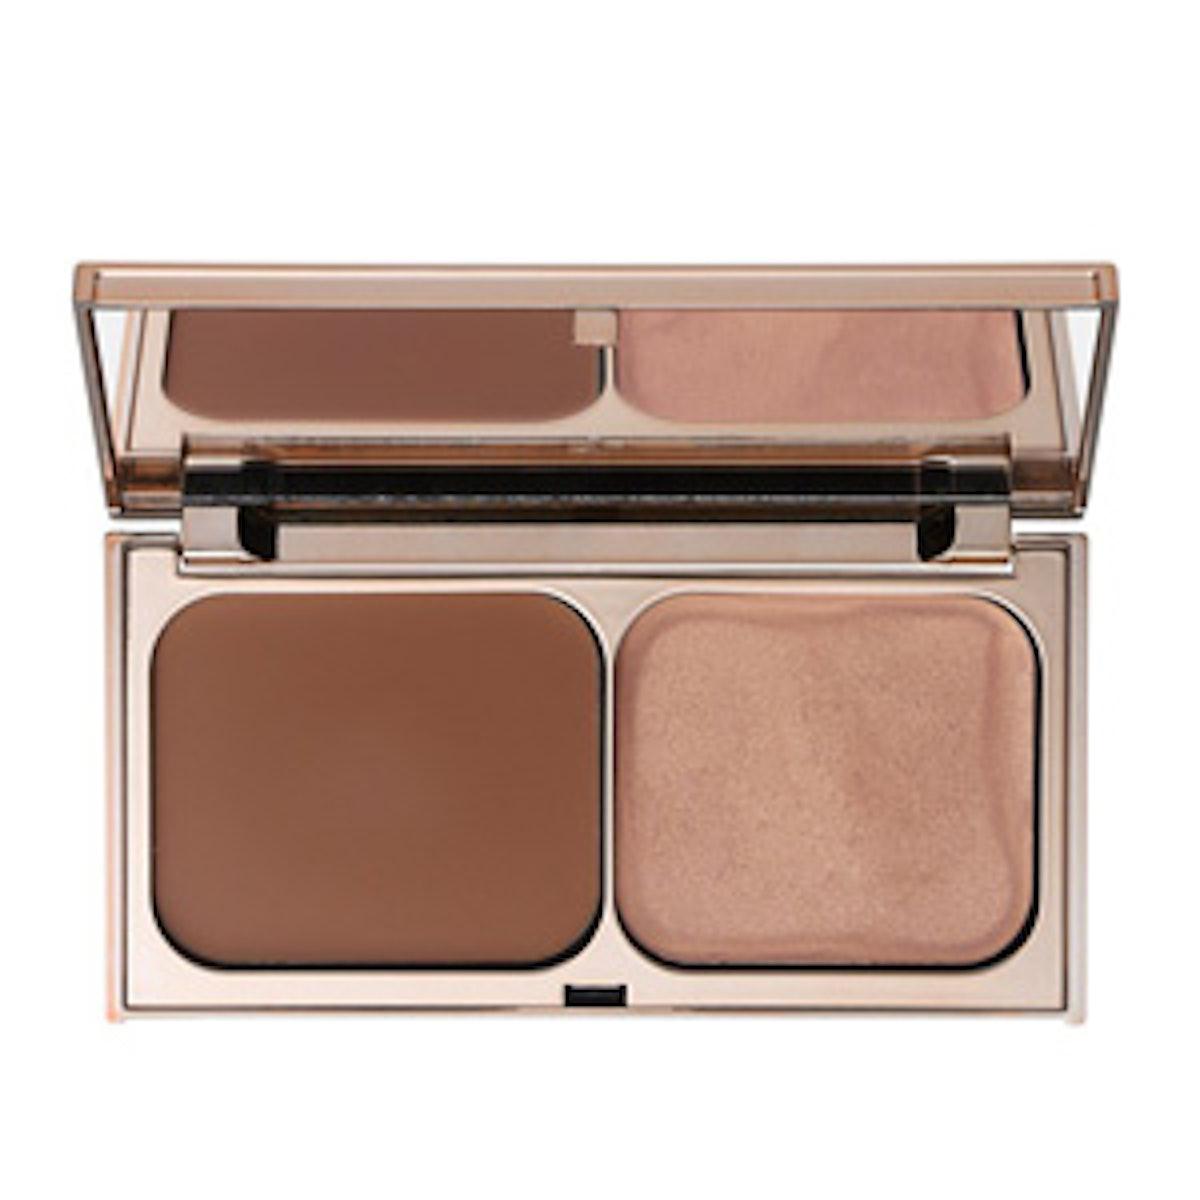 Filmstar Bronze & Glow Limited Edition Palette